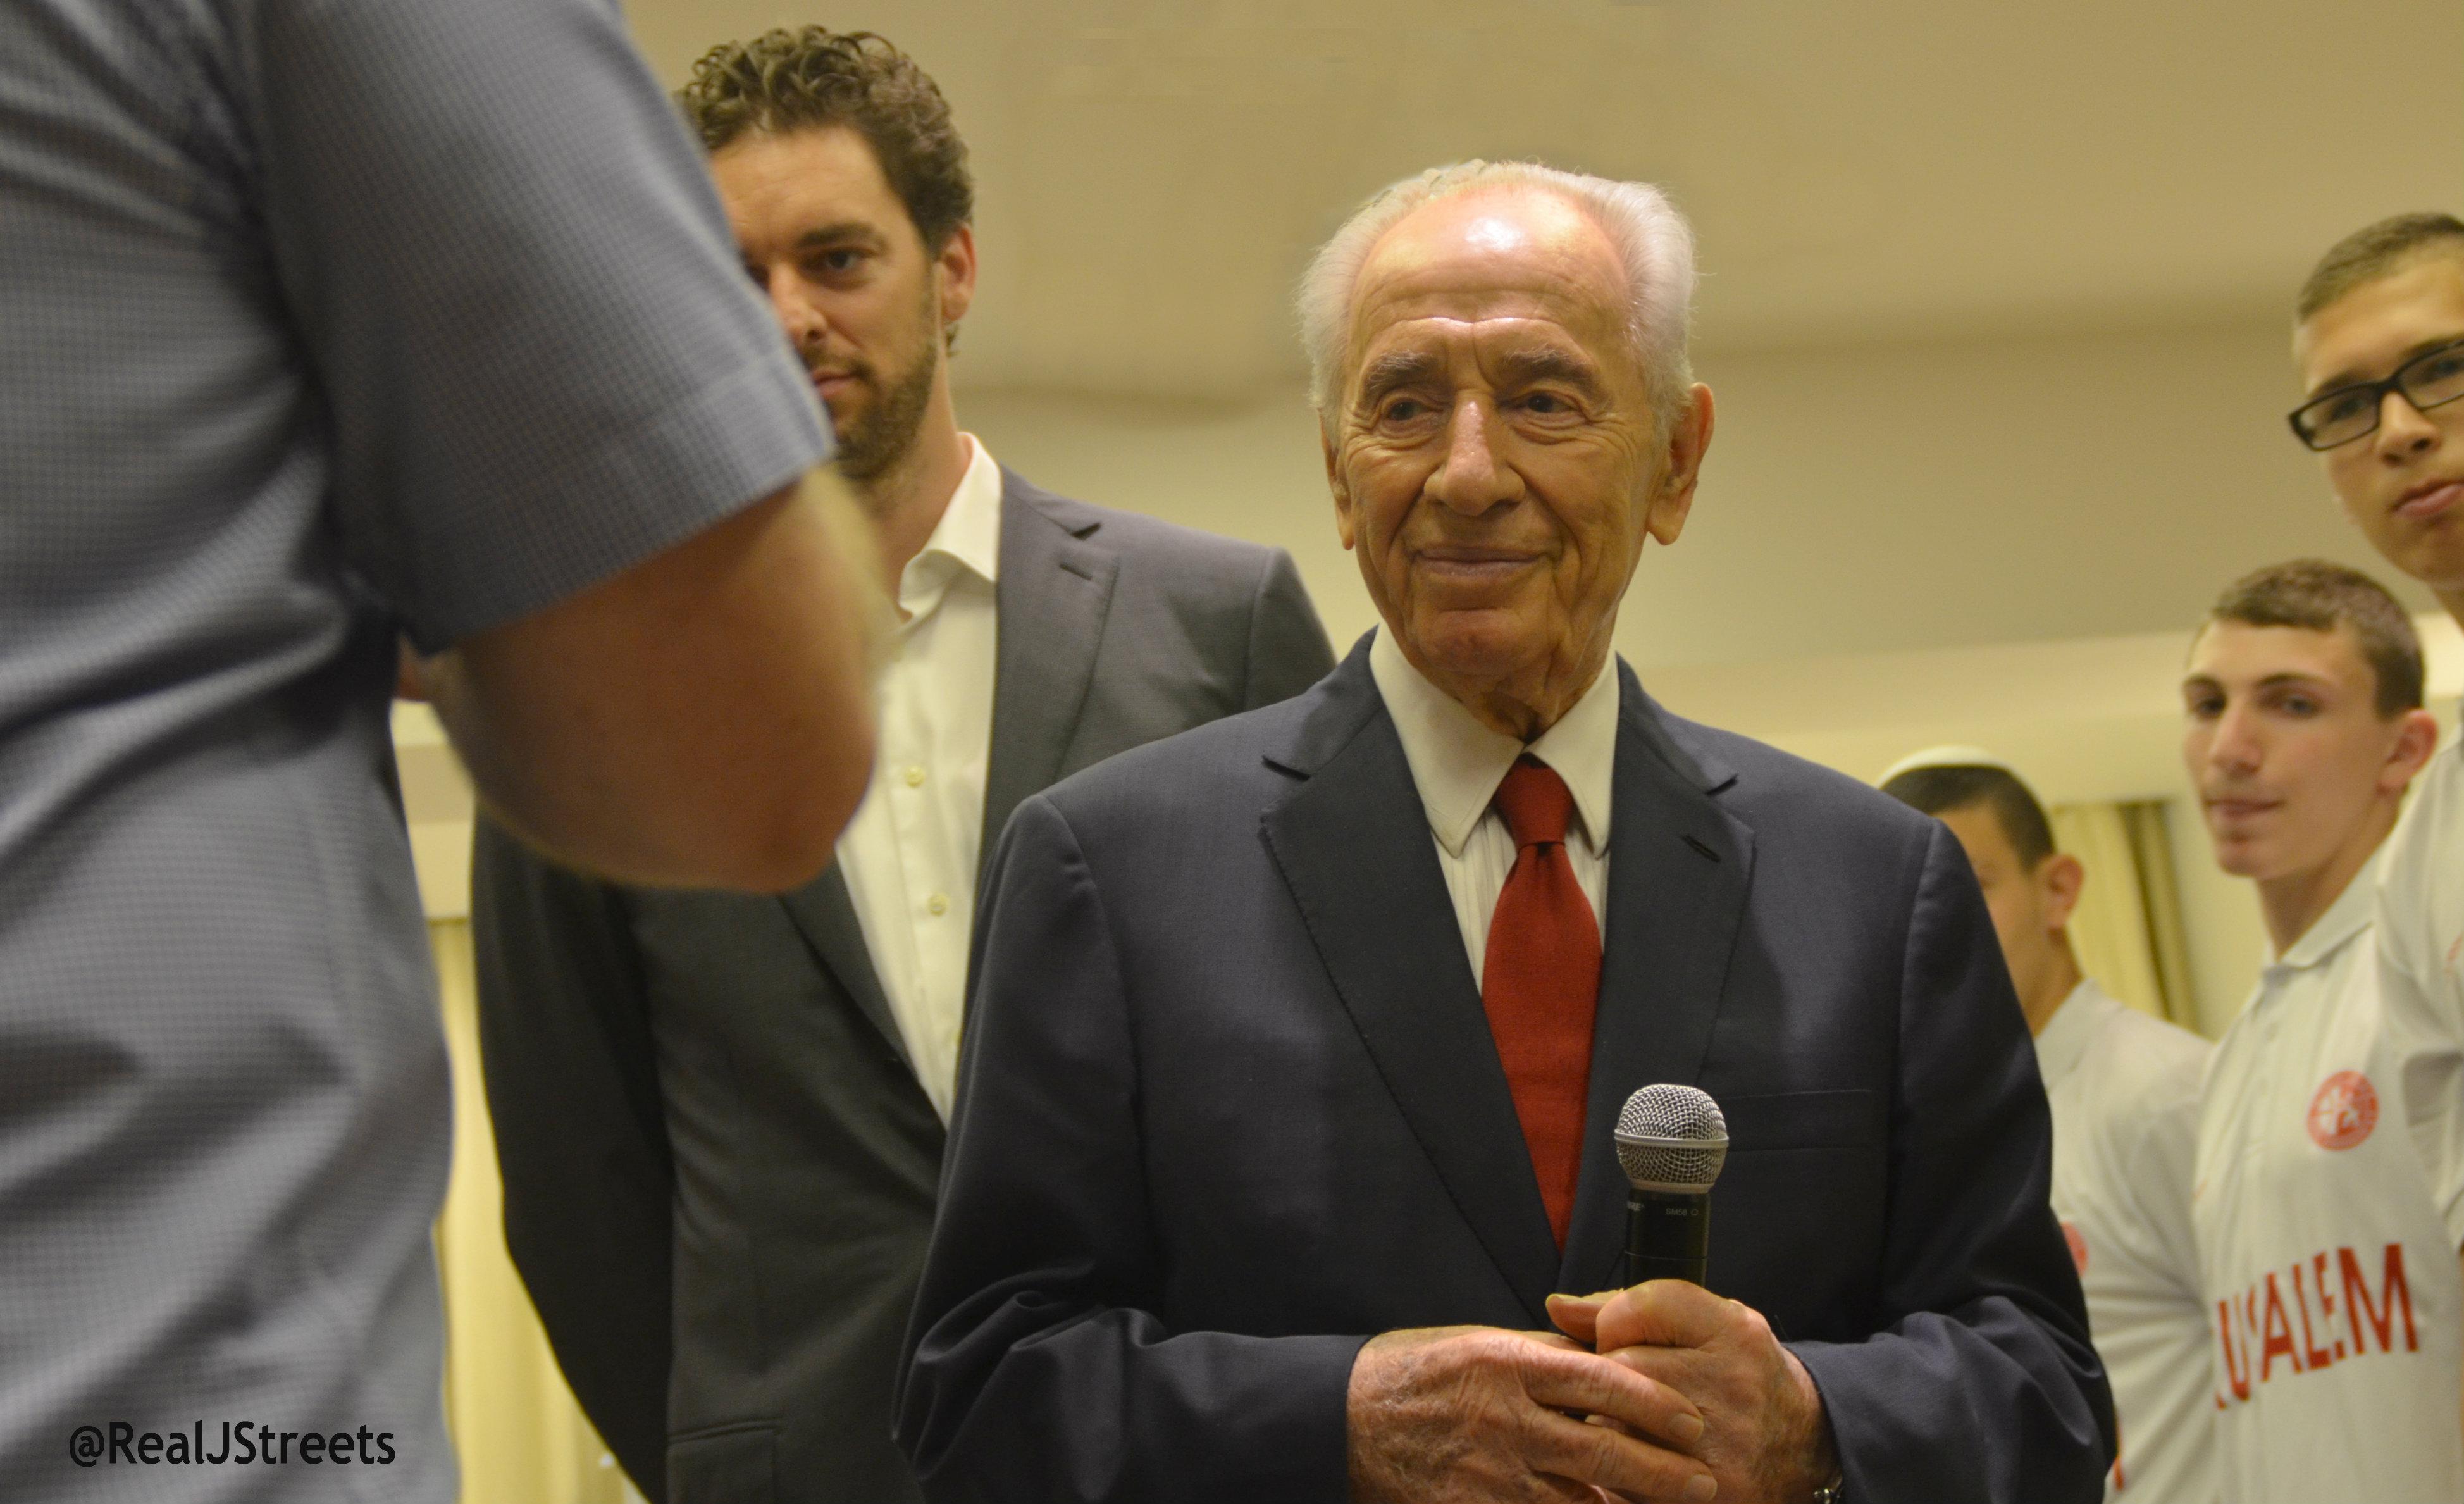 image Peres,